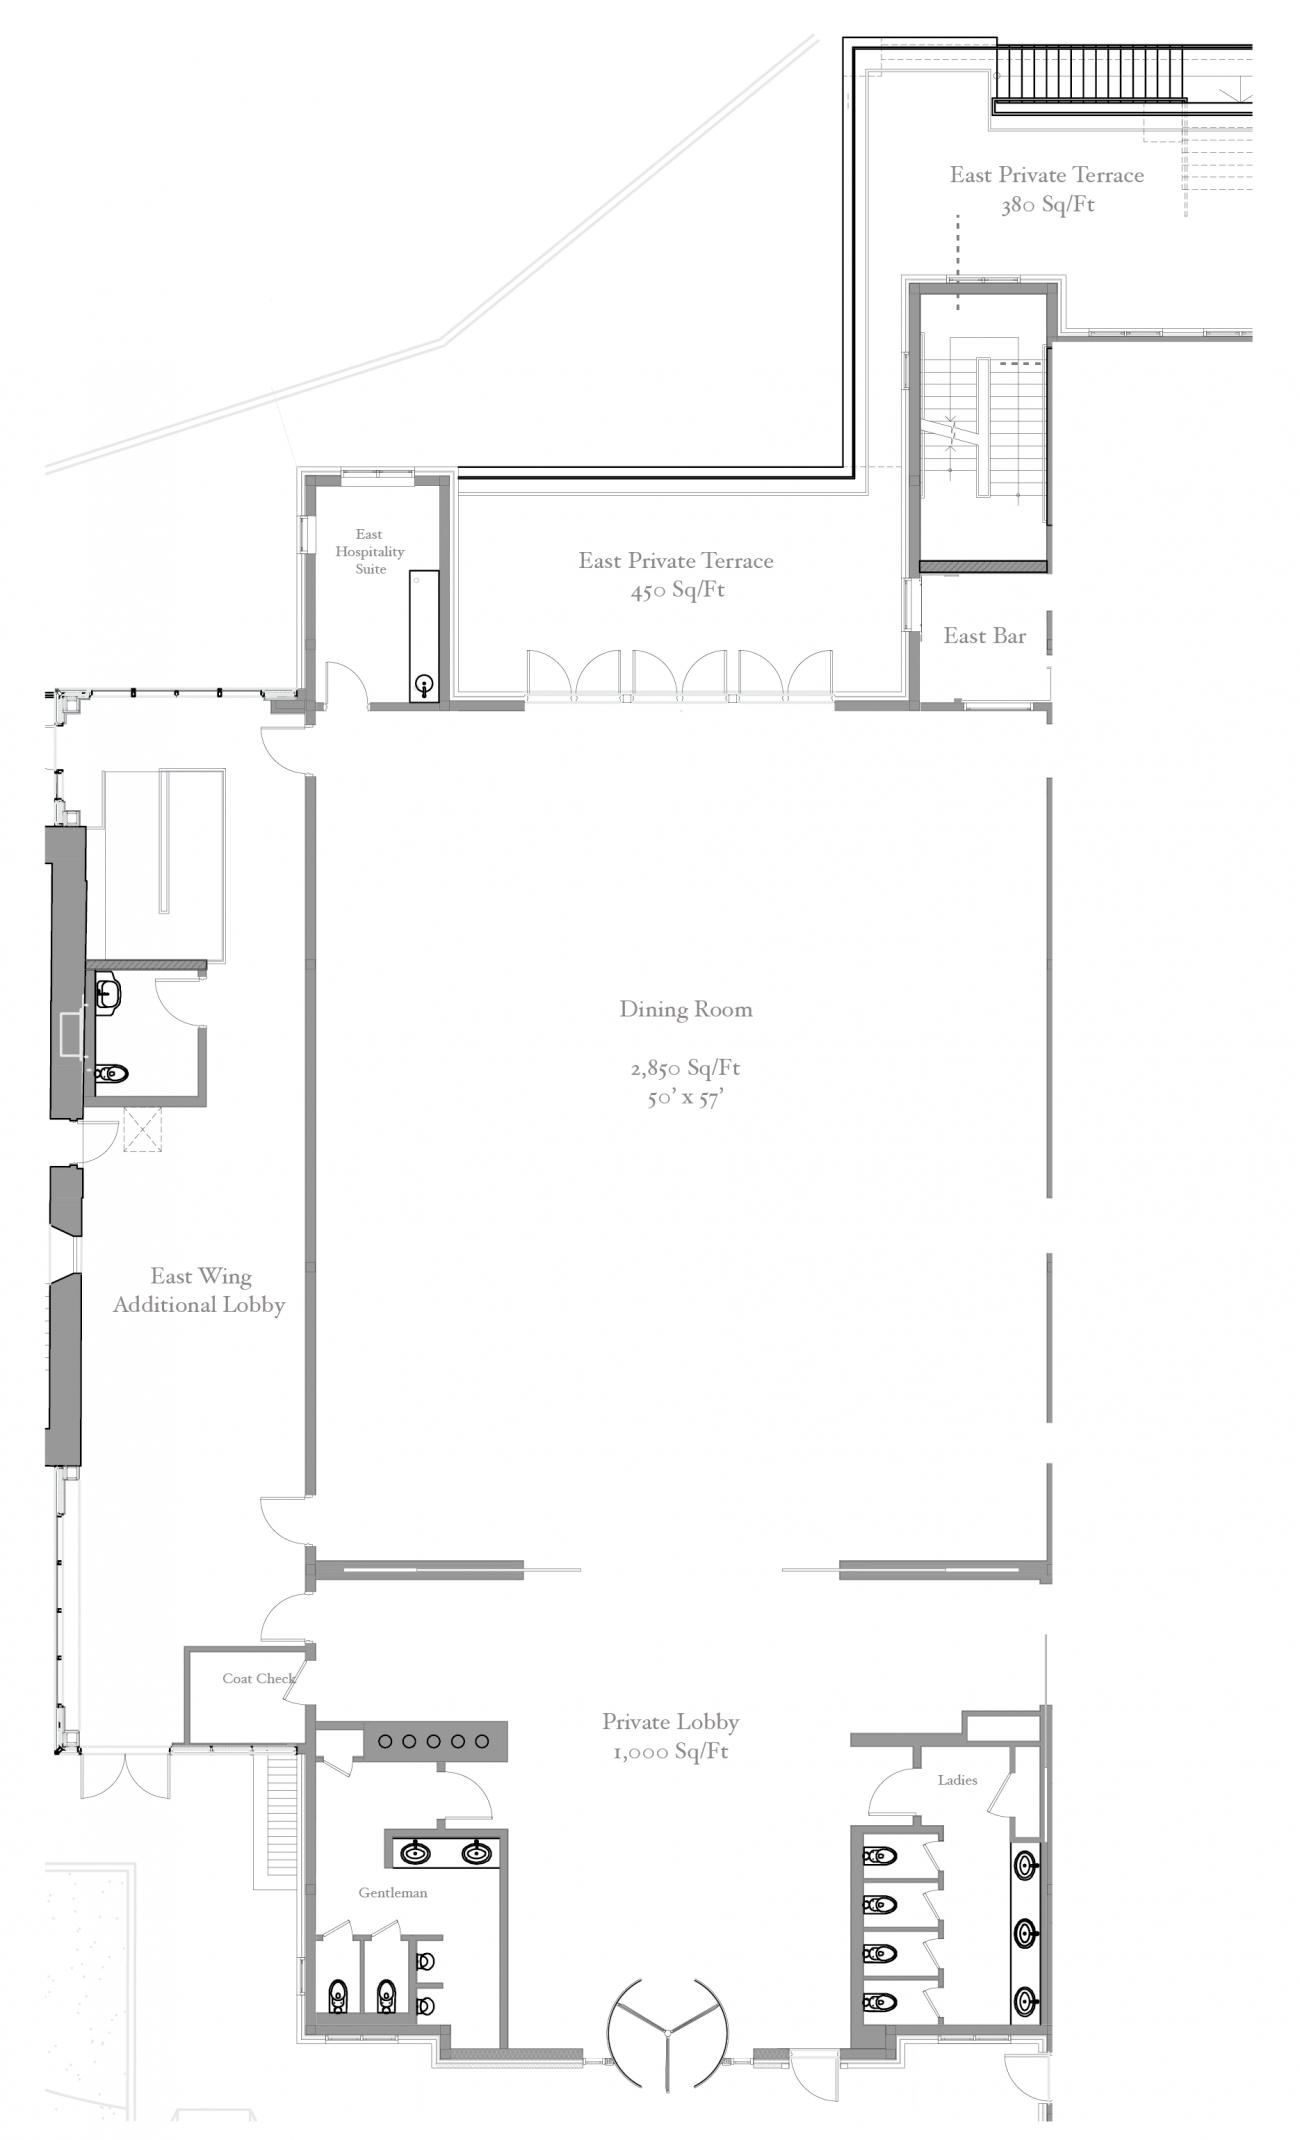 Floorplan of the East wing